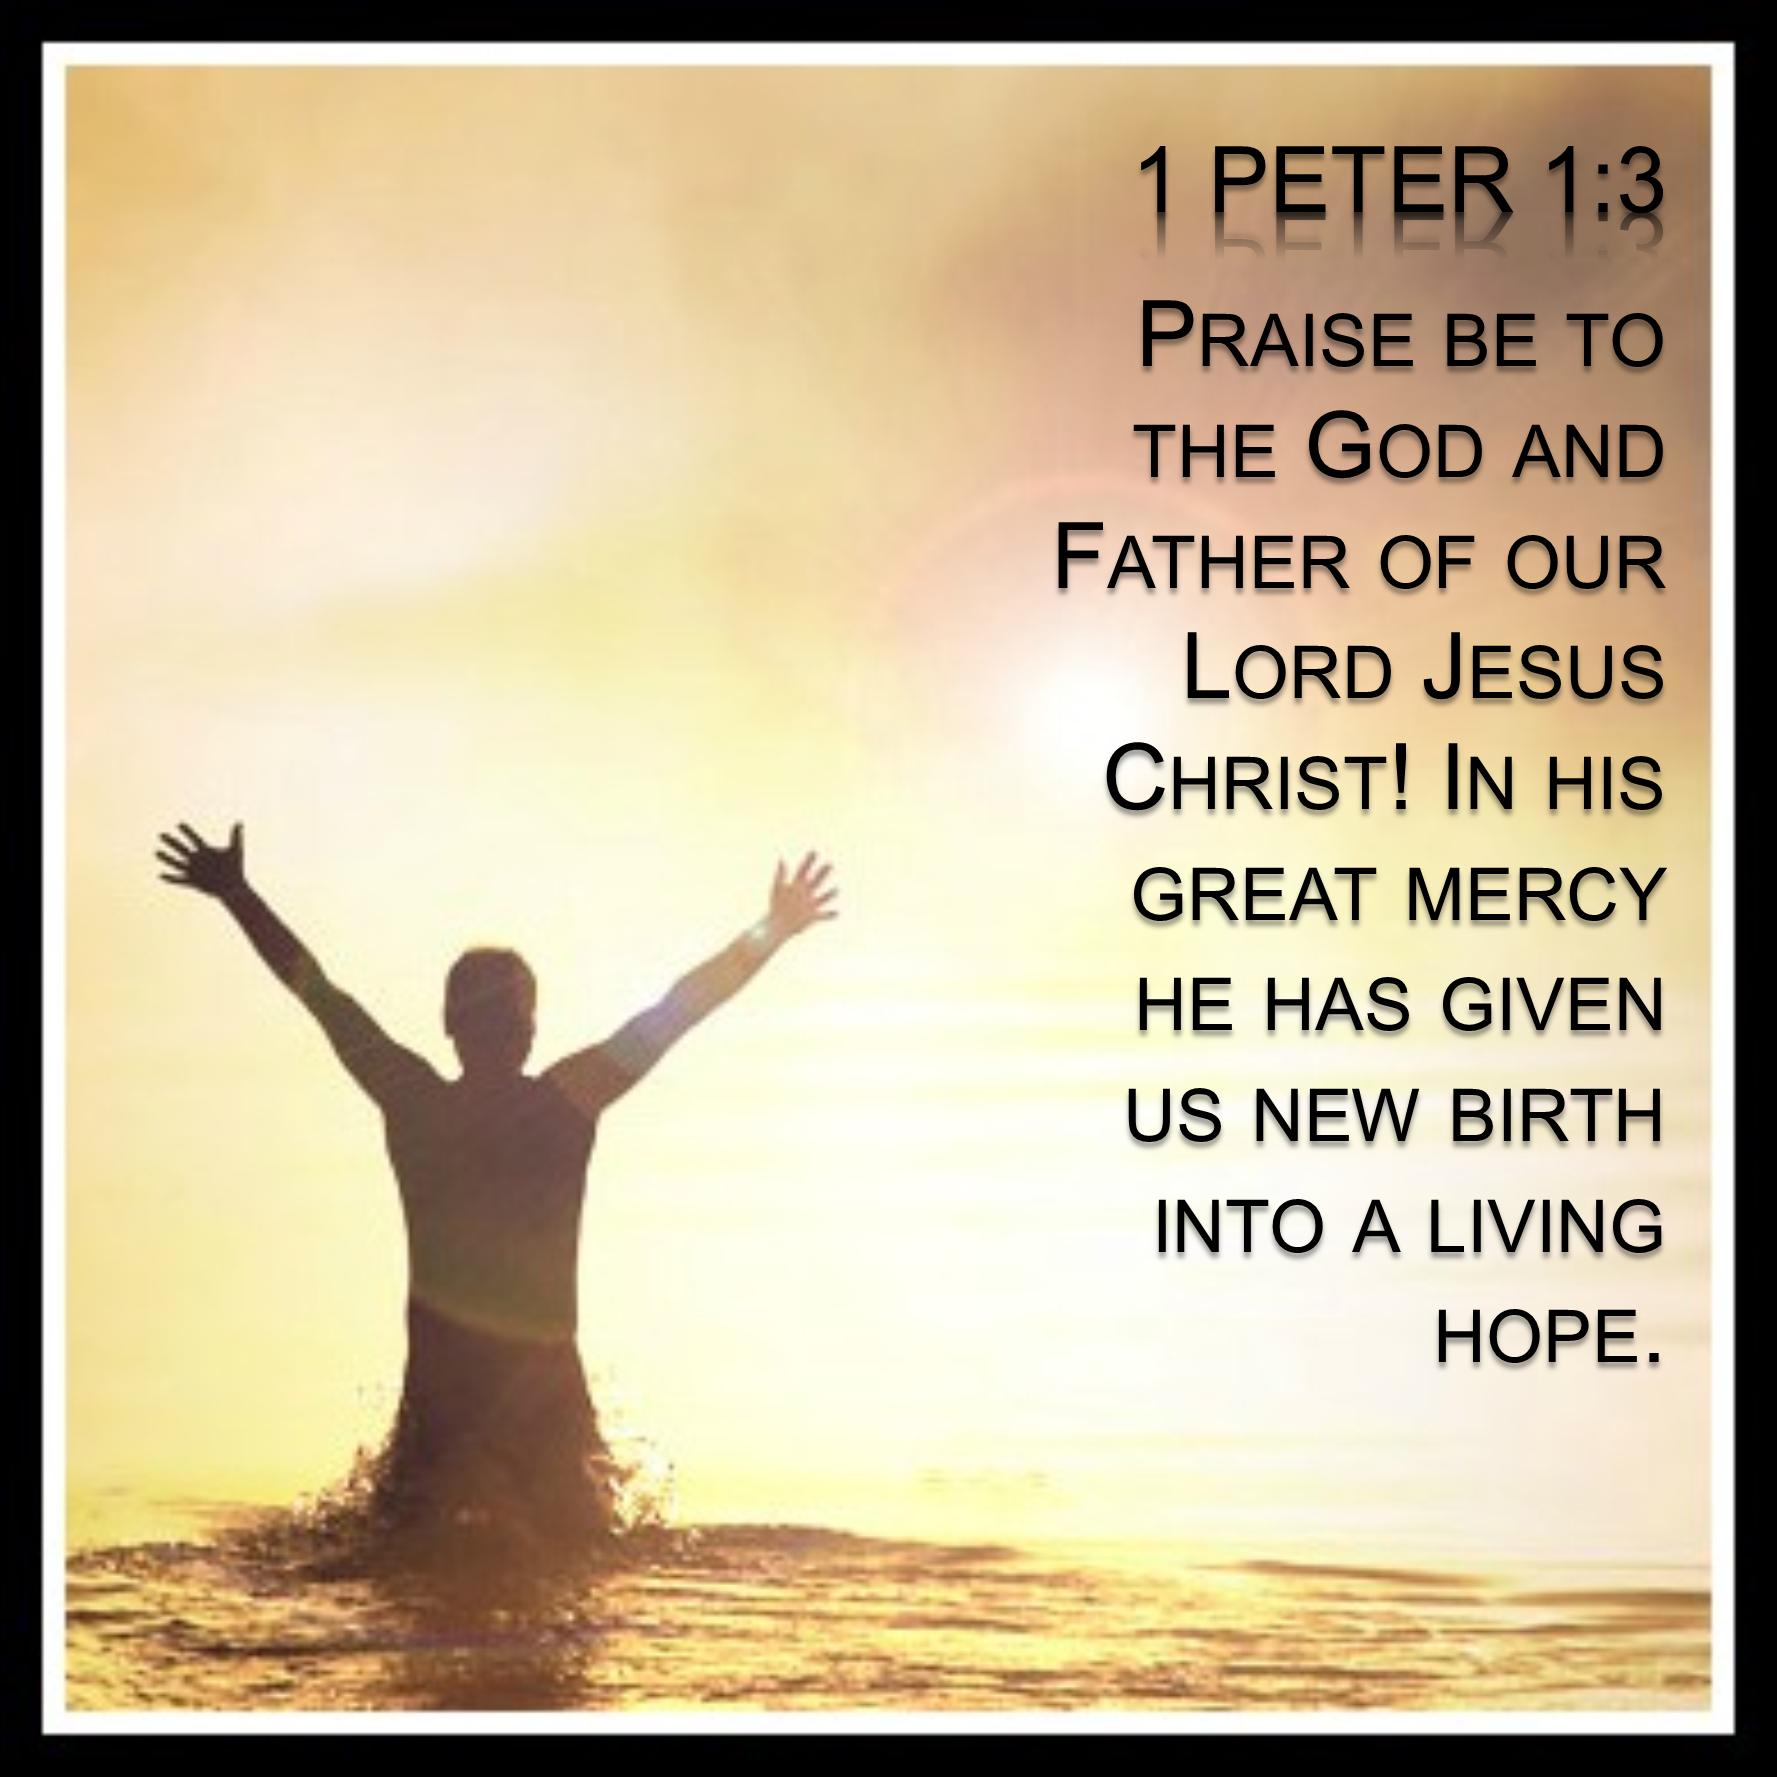 1 Peter - 1:3